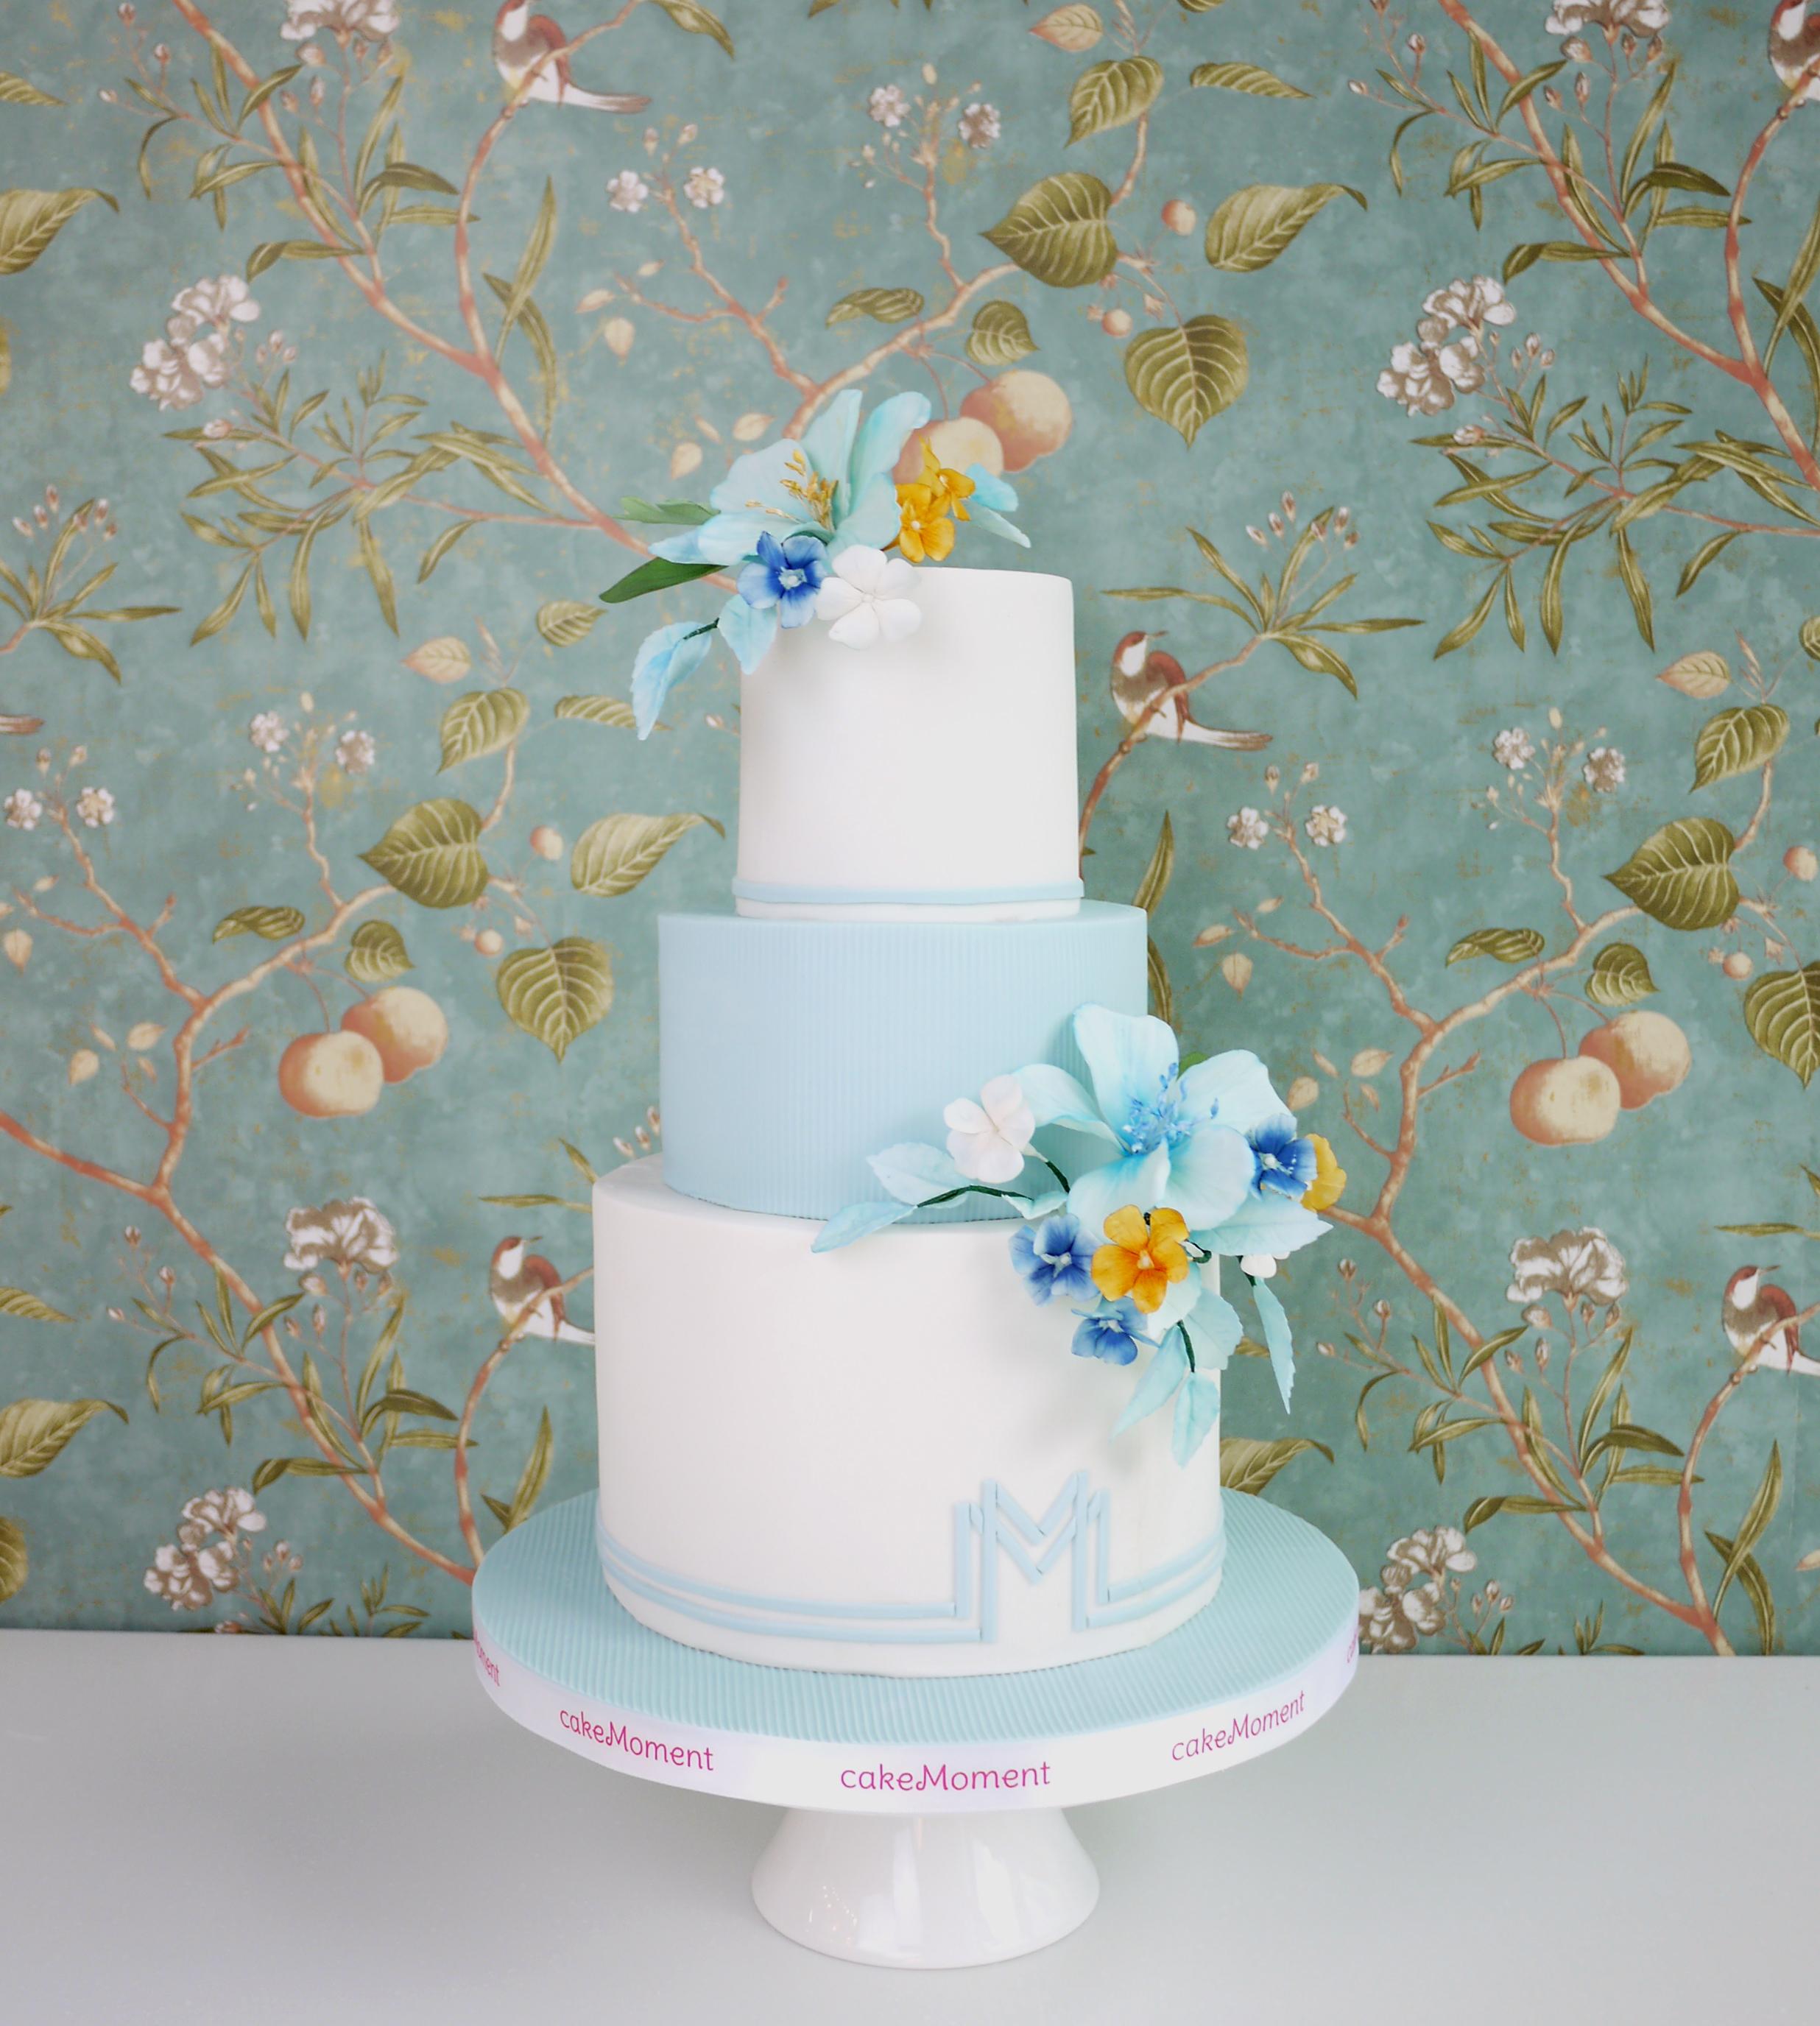 Light blue and white wedding